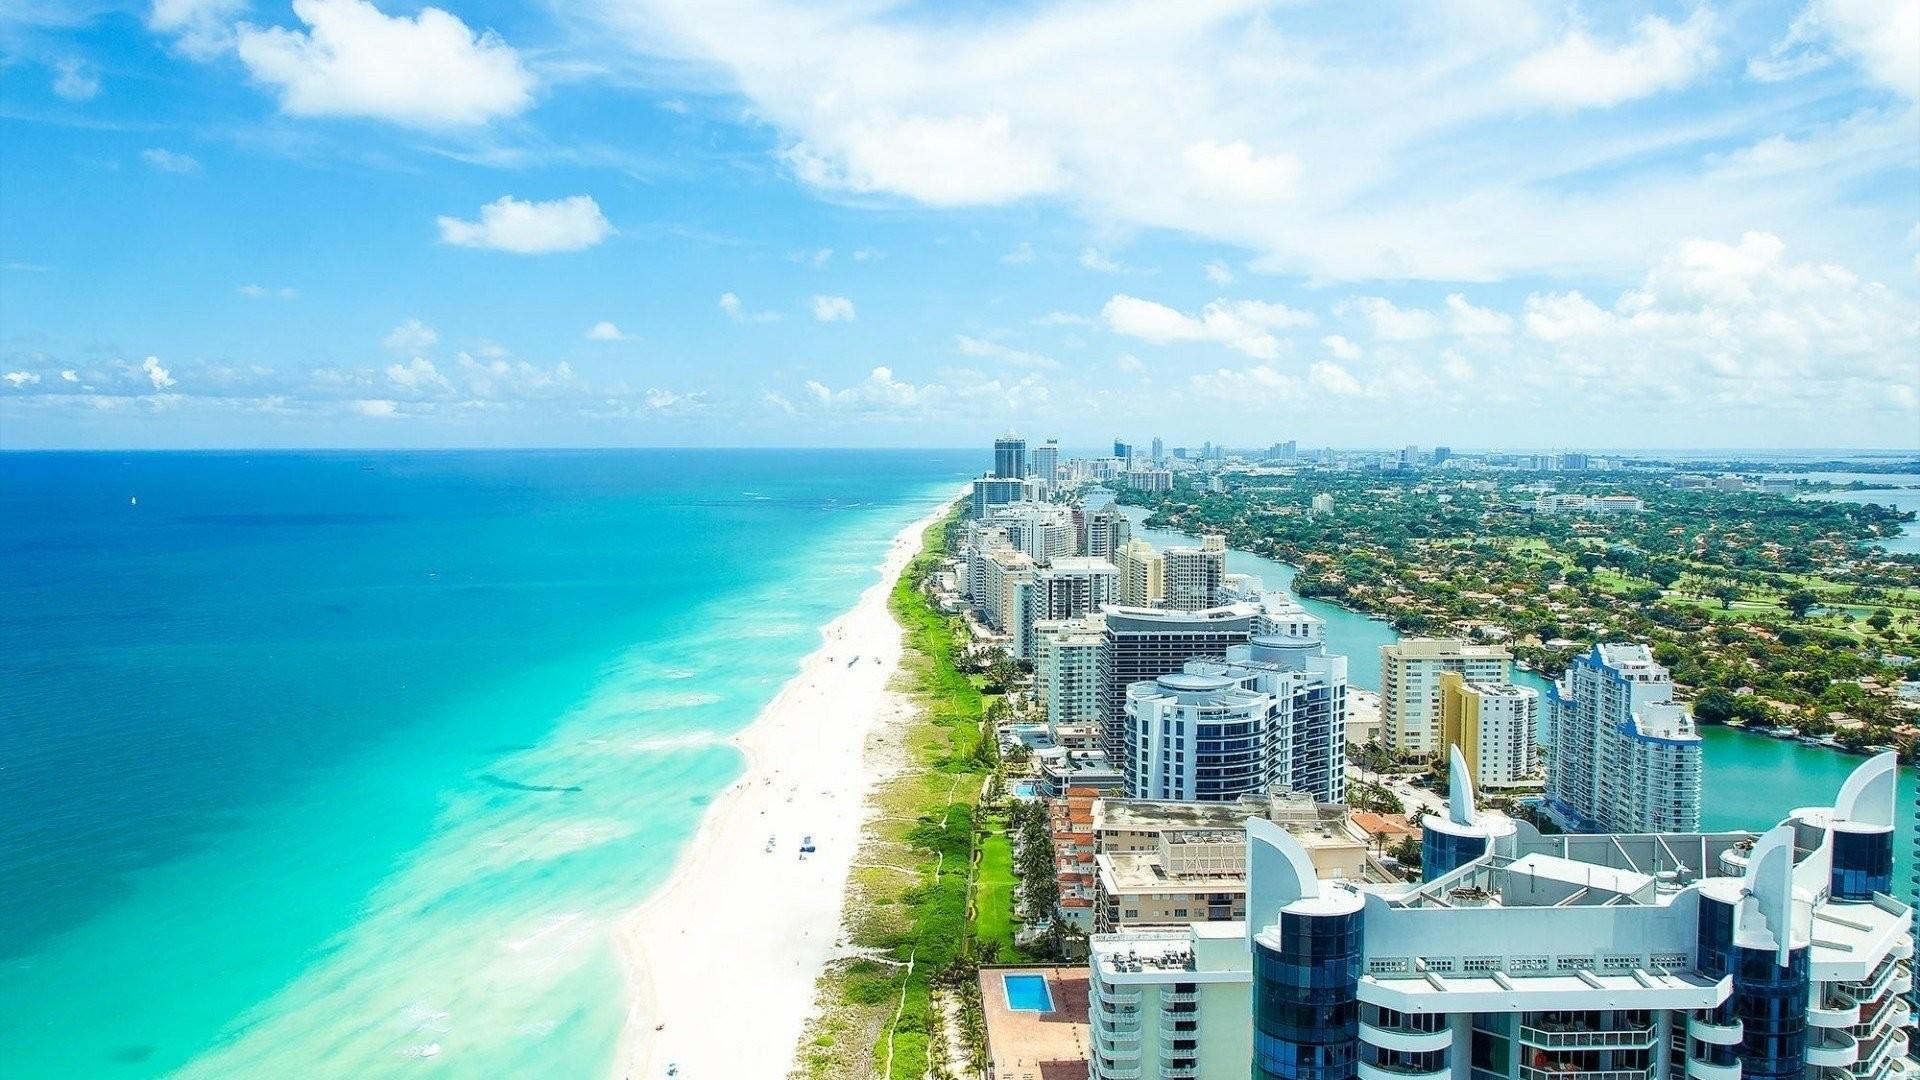 Miami Beach Wallpaper (62+ Images